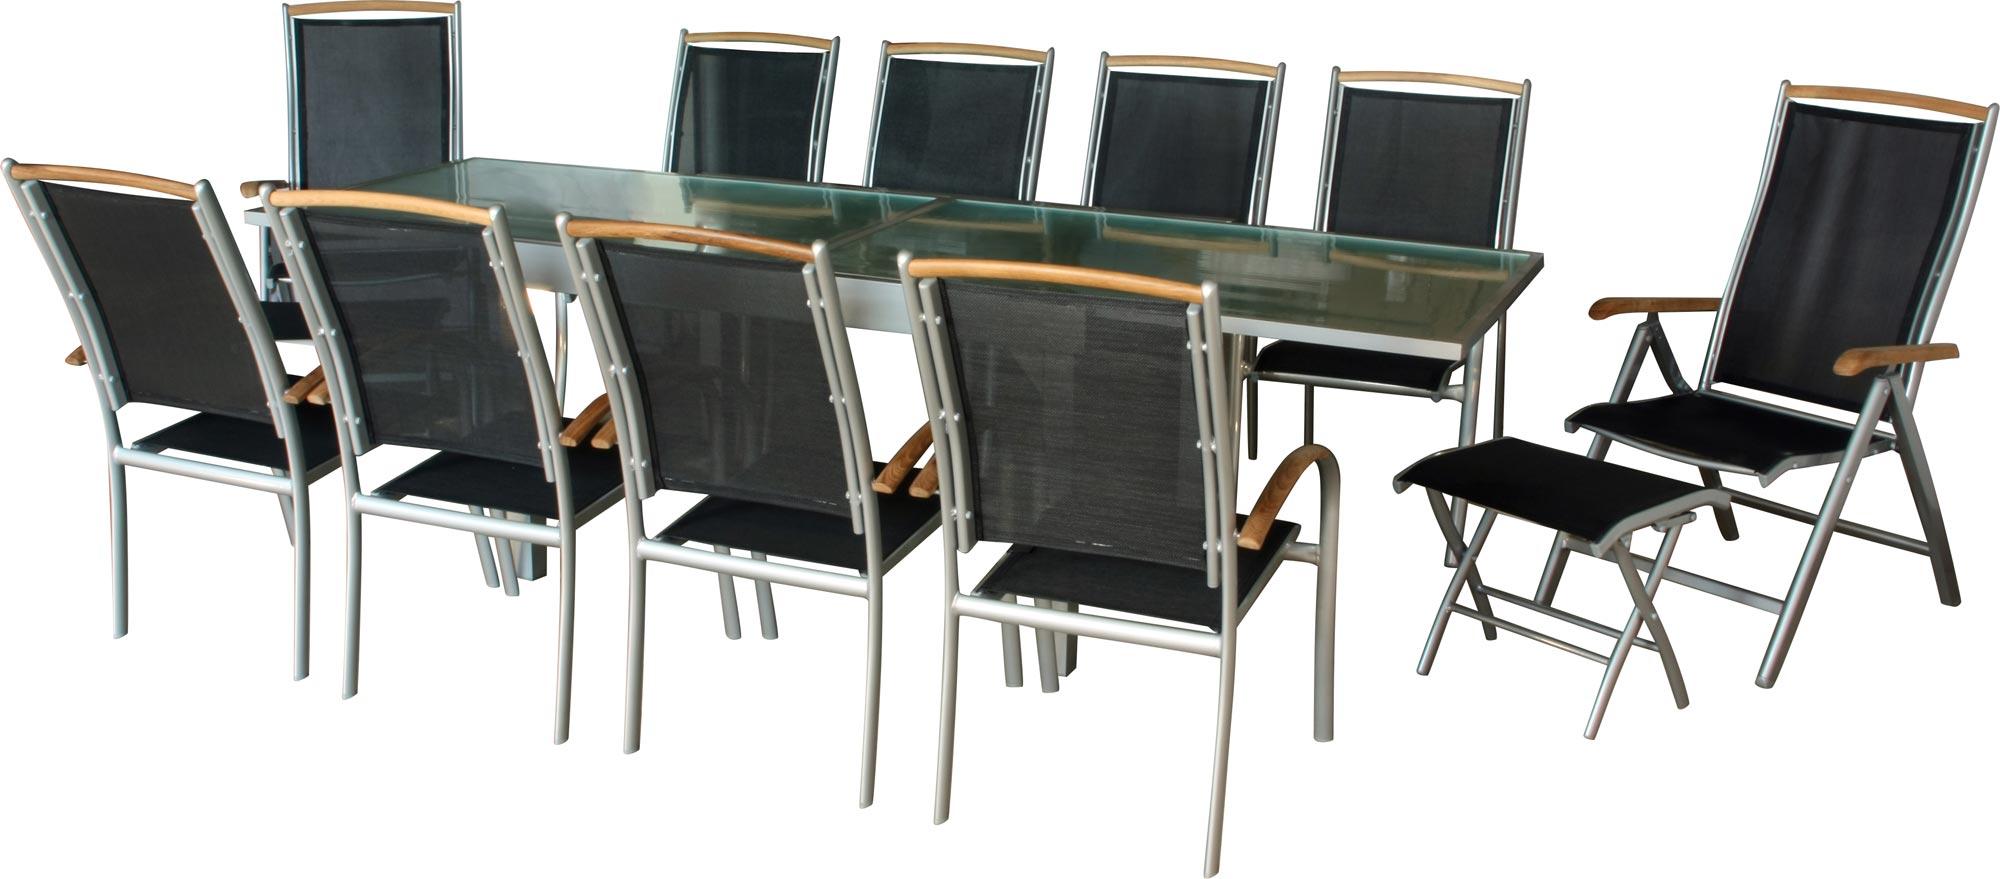 premium gartengruppe diplomat xxl 13x silber garnitur. Black Bedroom Furniture Sets. Home Design Ideas